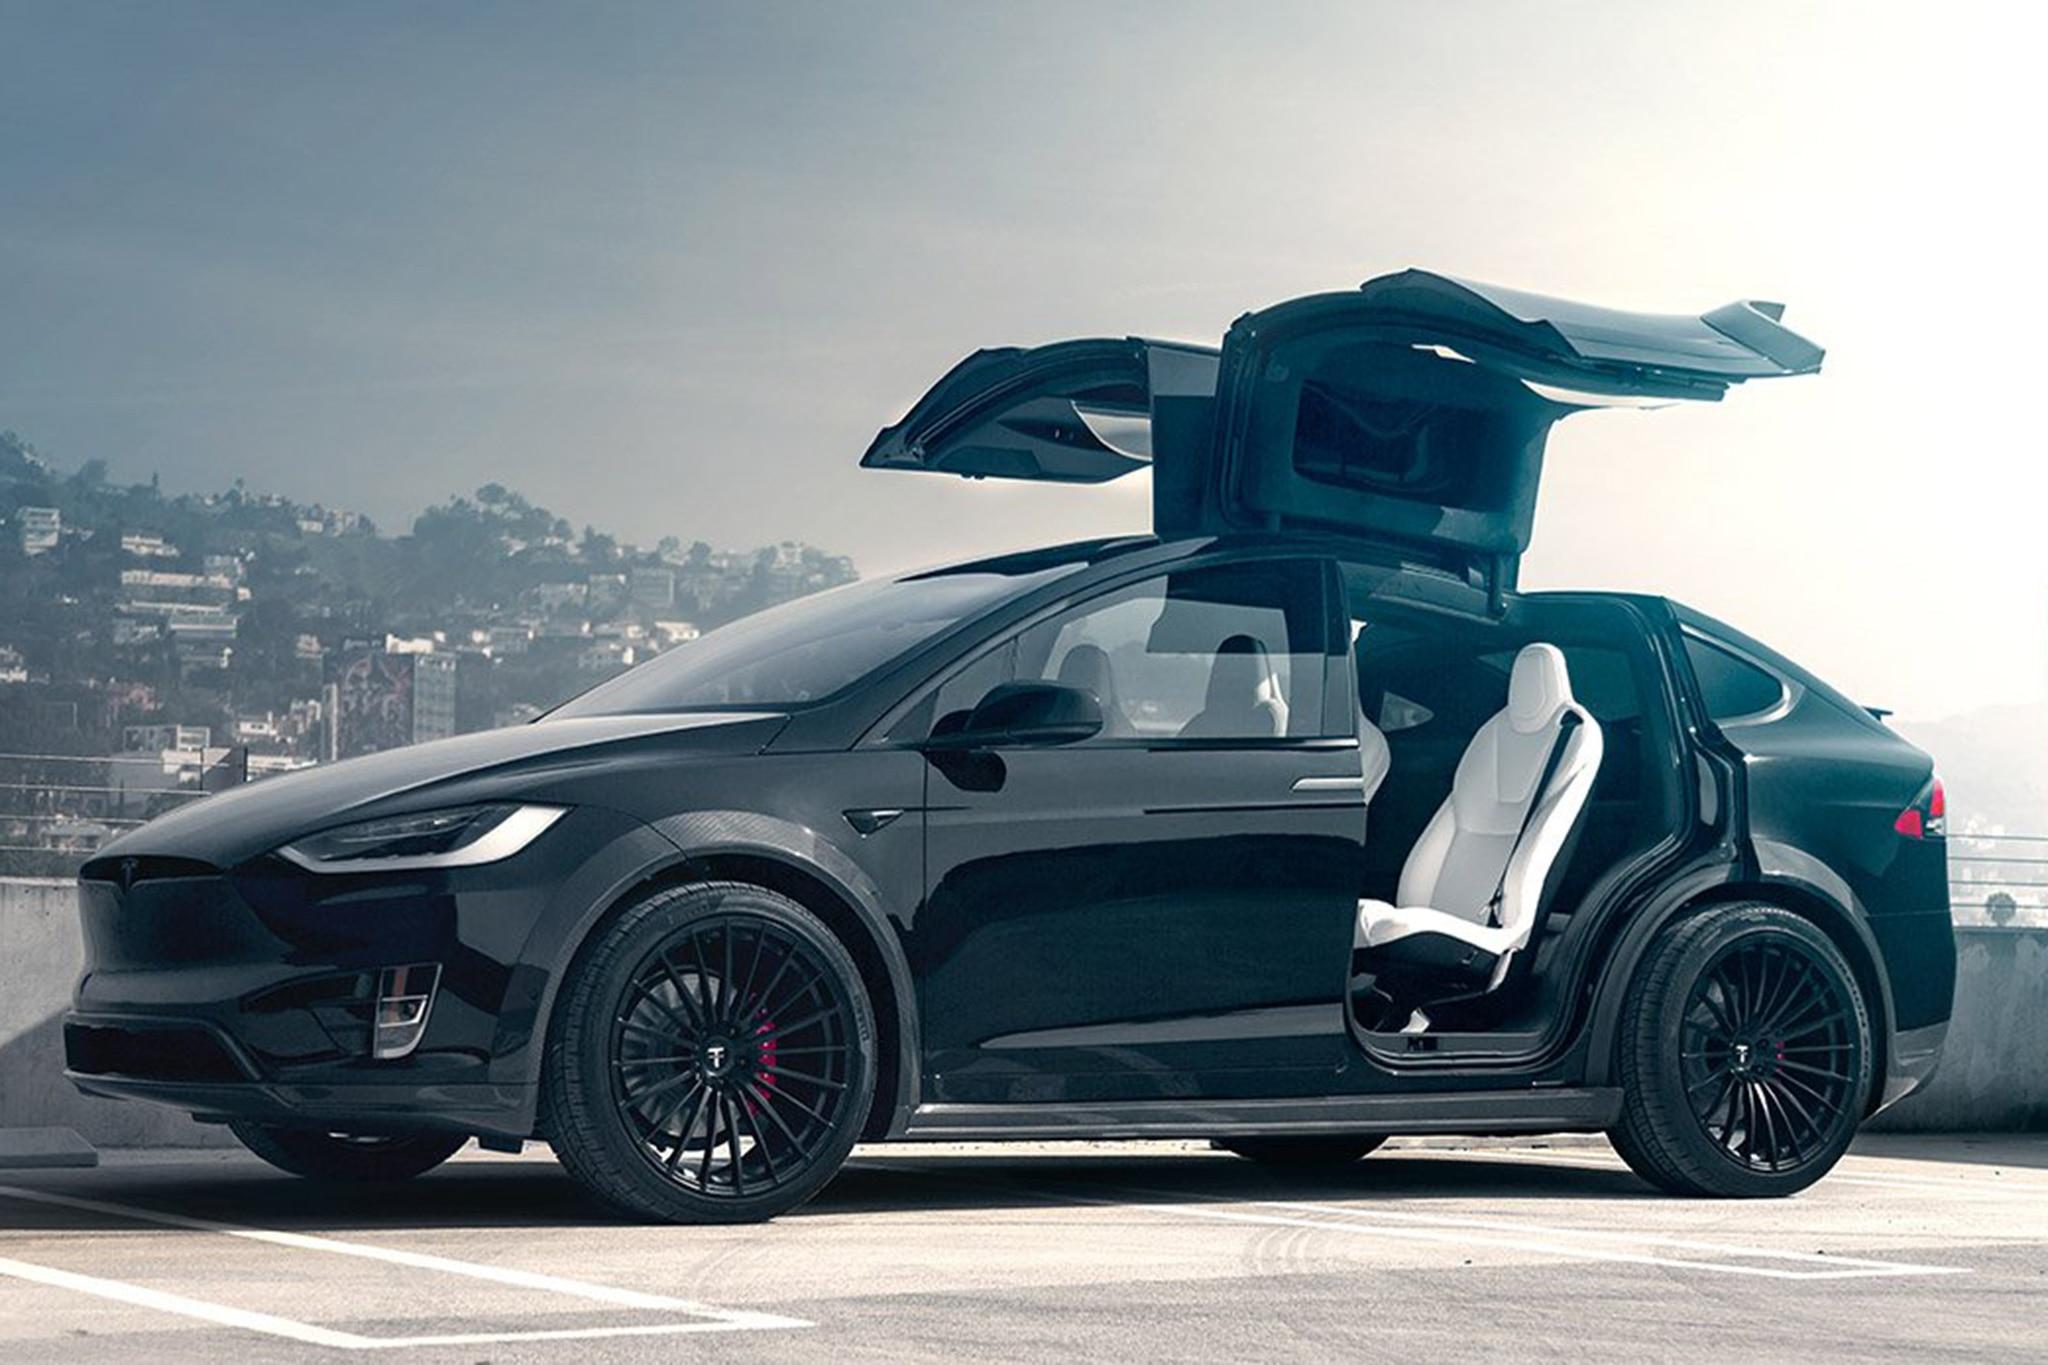 2018 tesla model x p100d gets t largo package by t sportline automobile magazine. Black Bedroom Furniture Sets. Home Design Ideas